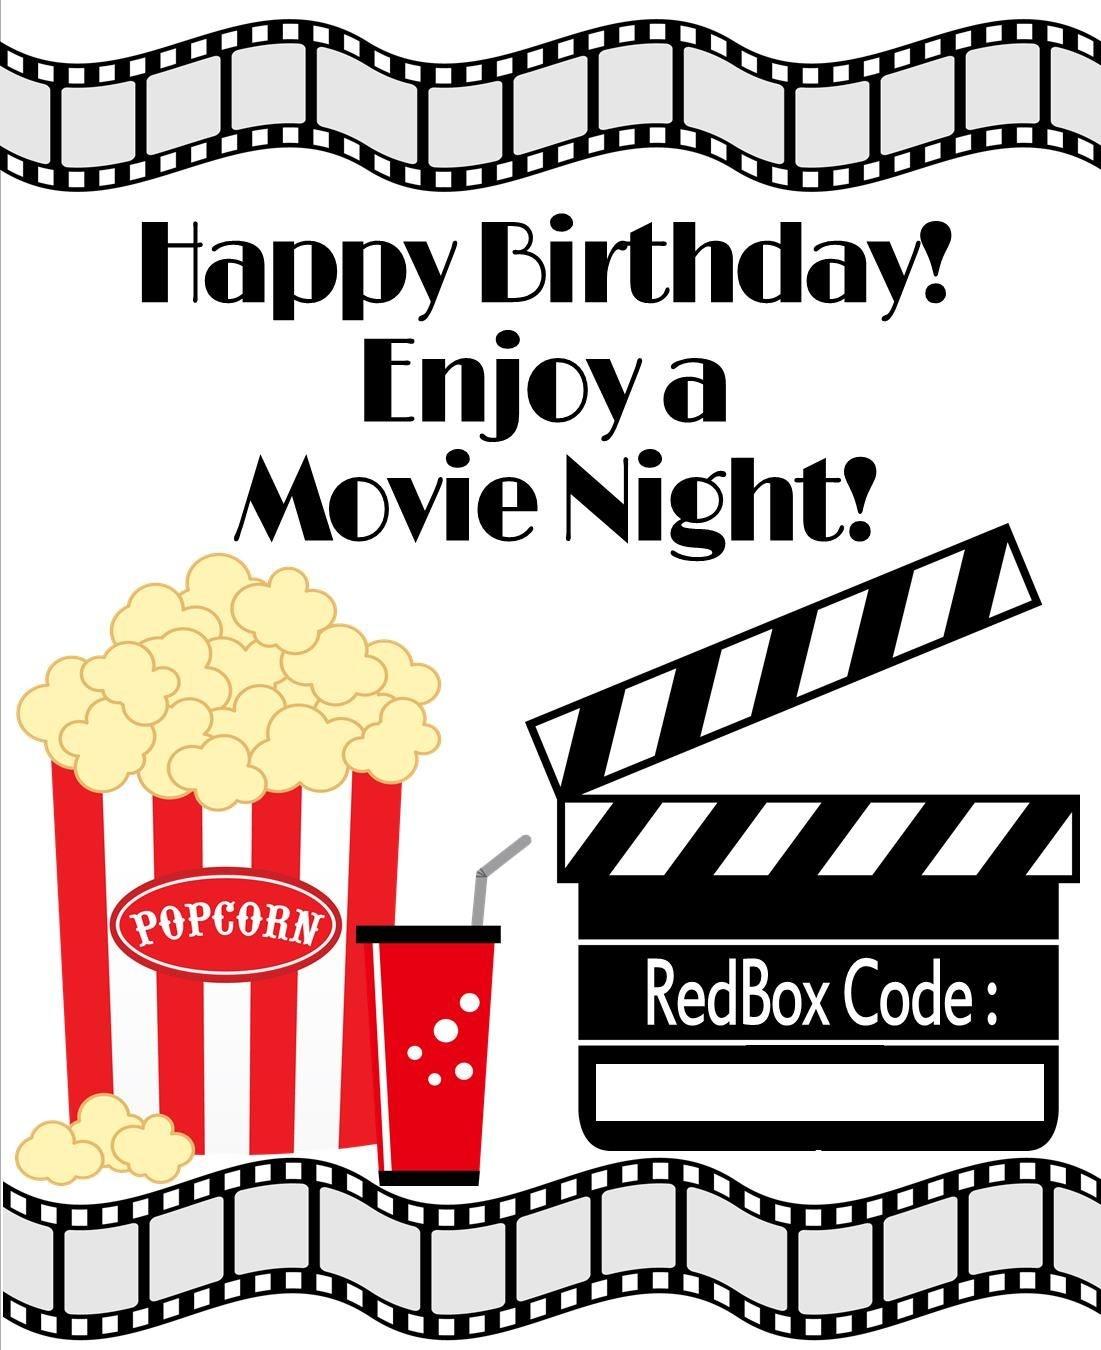 Redbox Printable Birthday Gift Tag - Diy - Printable File - Free Printable Redbox Gift Tags